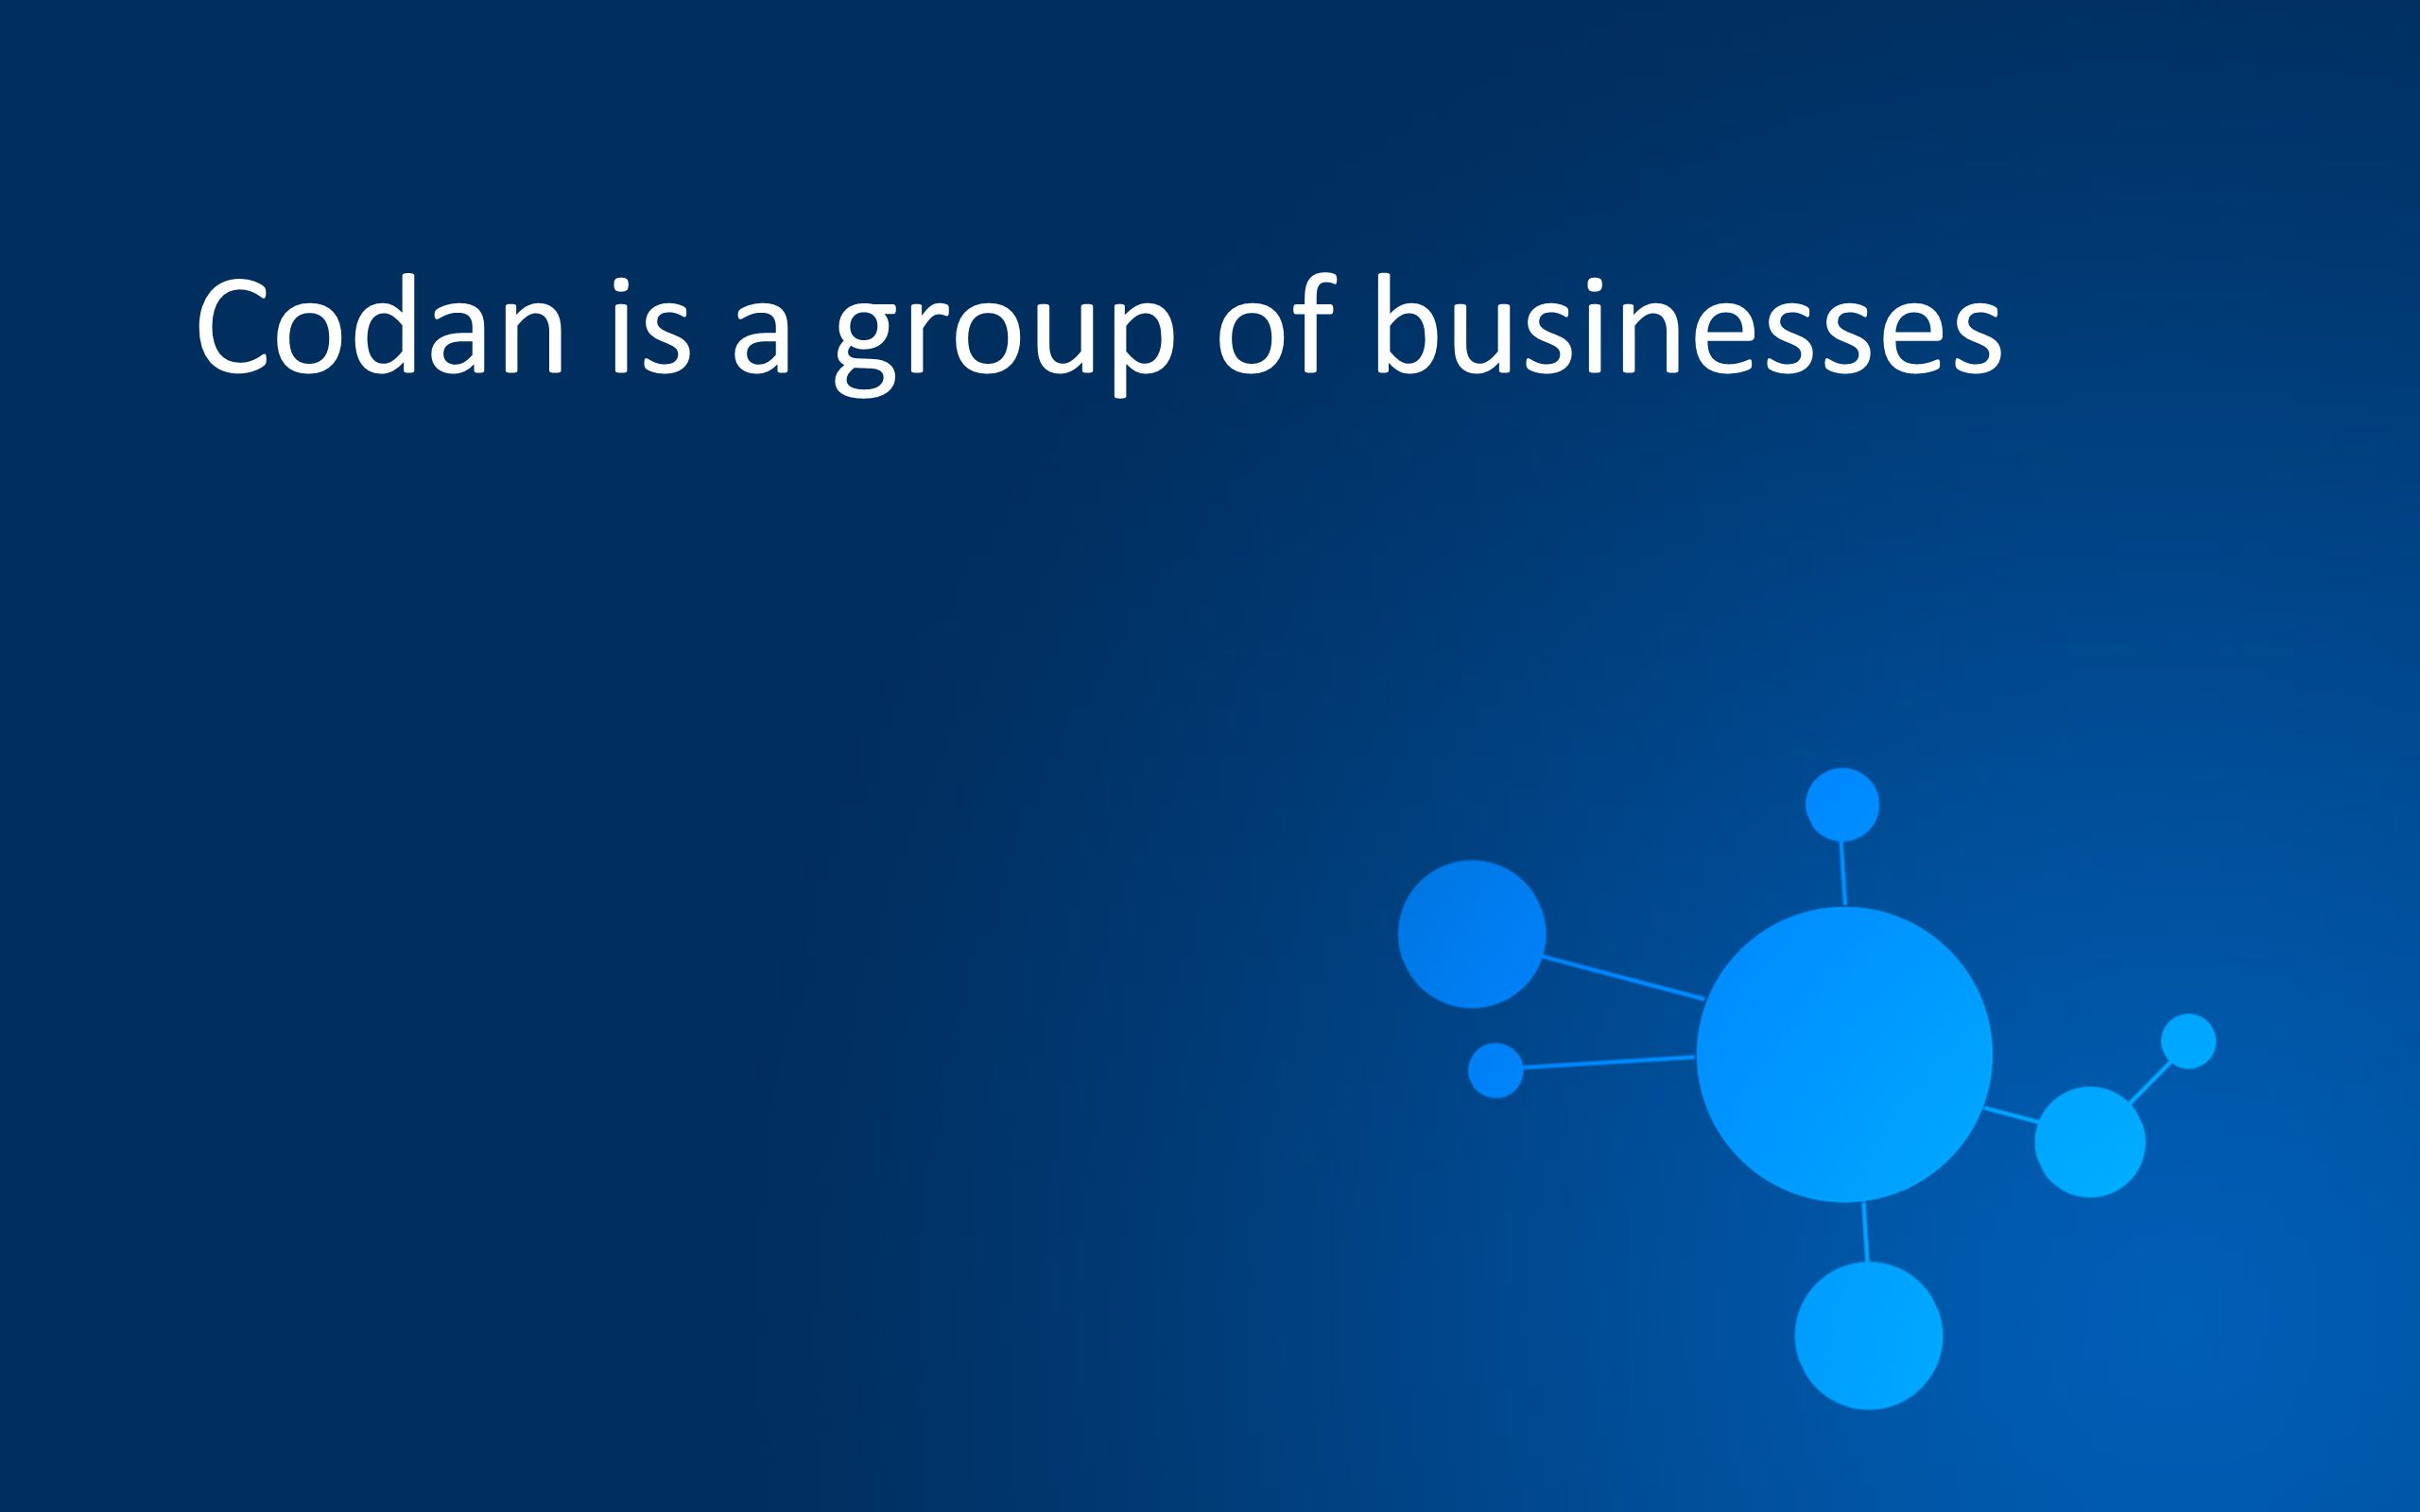 www.codan.com.au